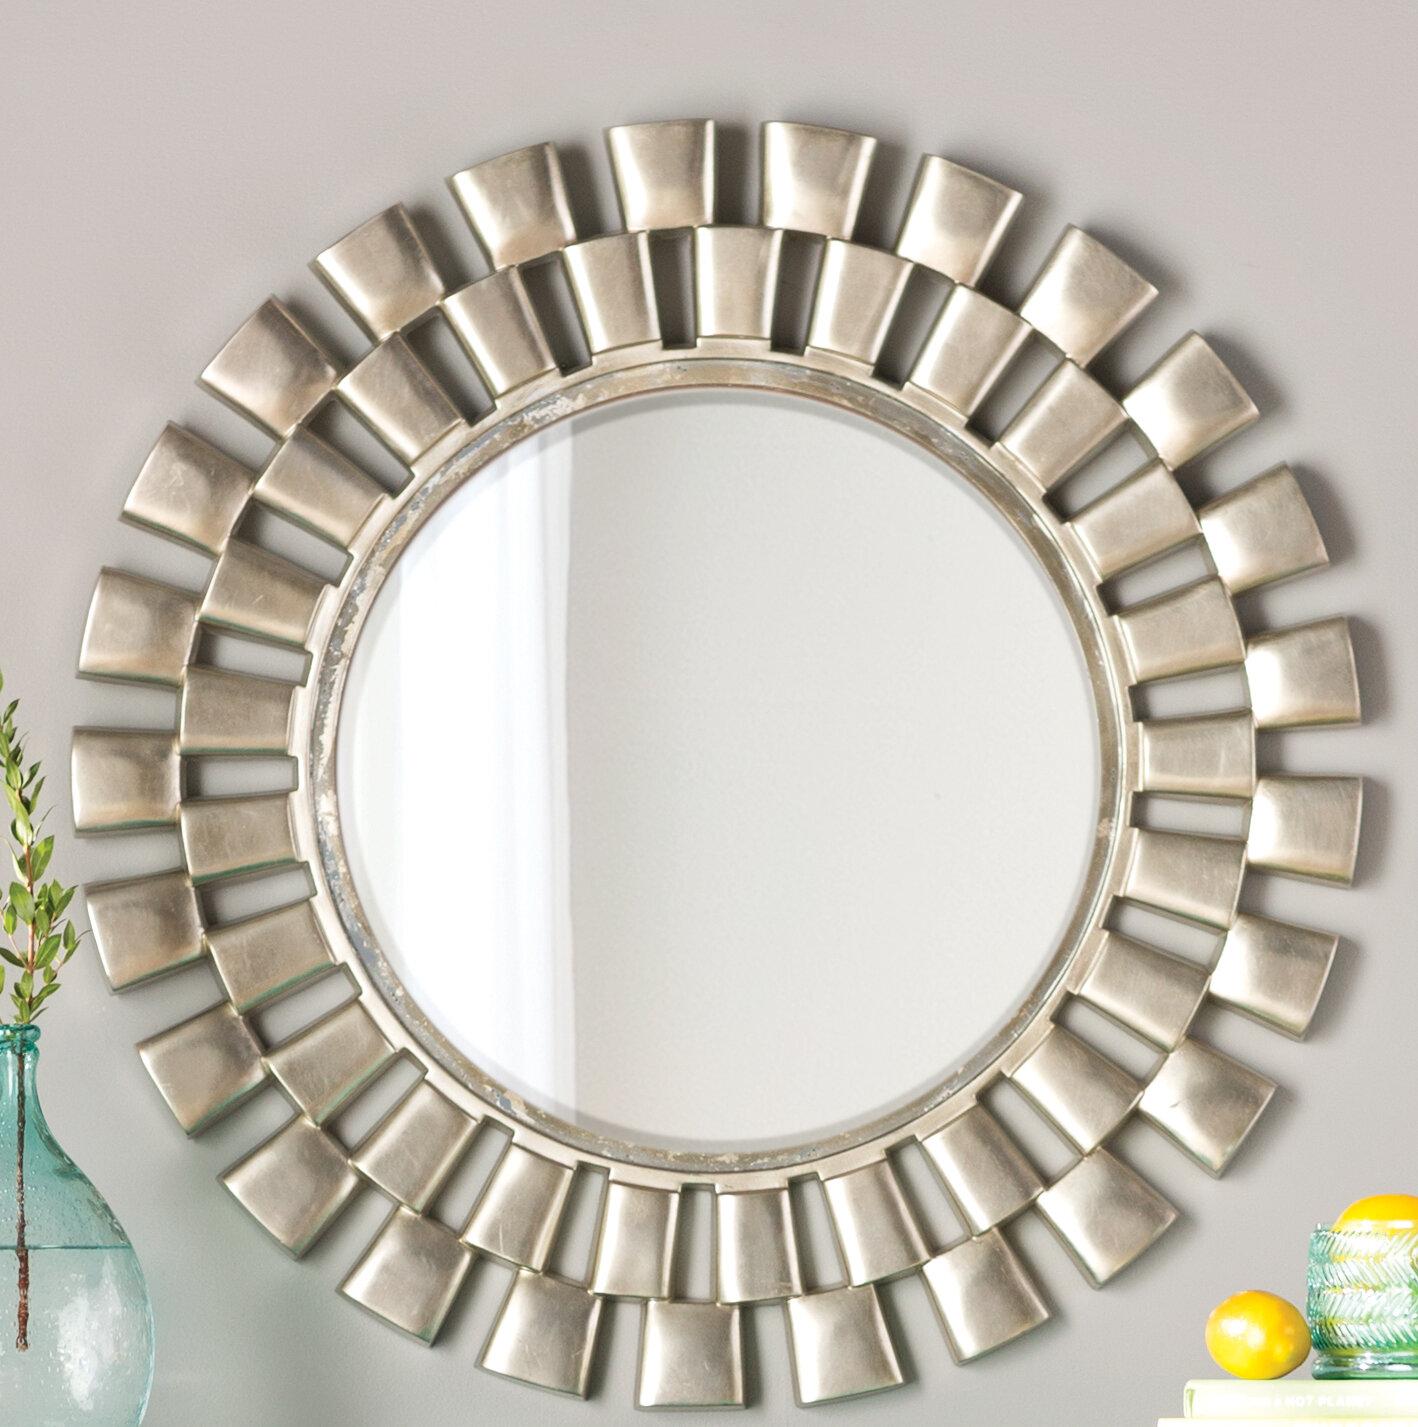 Willa Arlo Interiors Glam Beveled Accent Mirror Reviews Wayfair